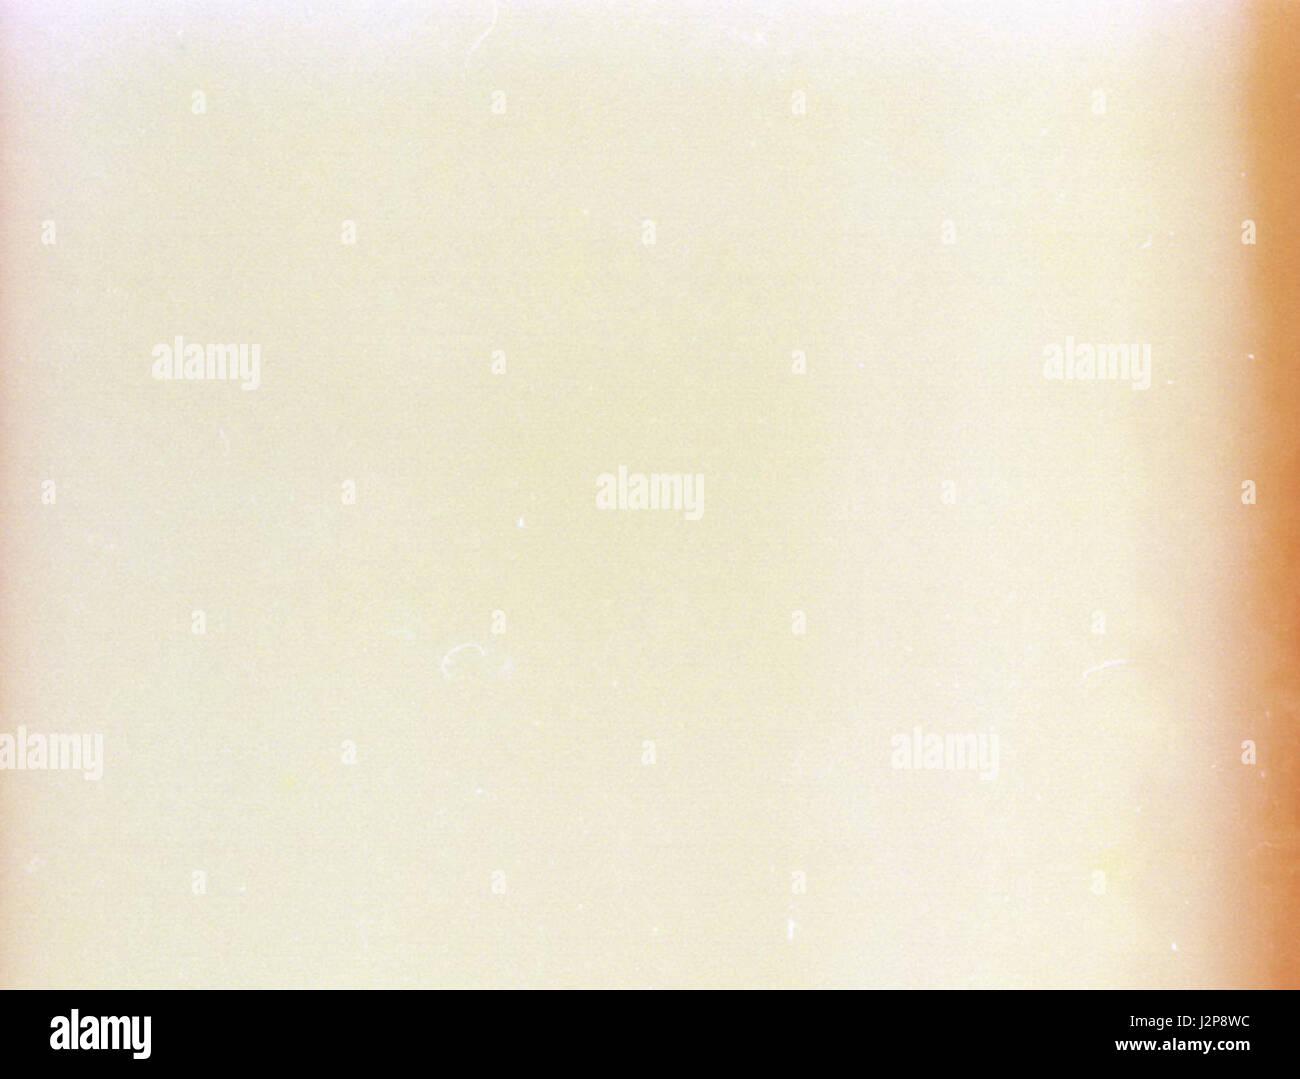 Vieux film main filament cassé.Blank old grunge frame background bande de film. Format vectoriel. Banque D'Images